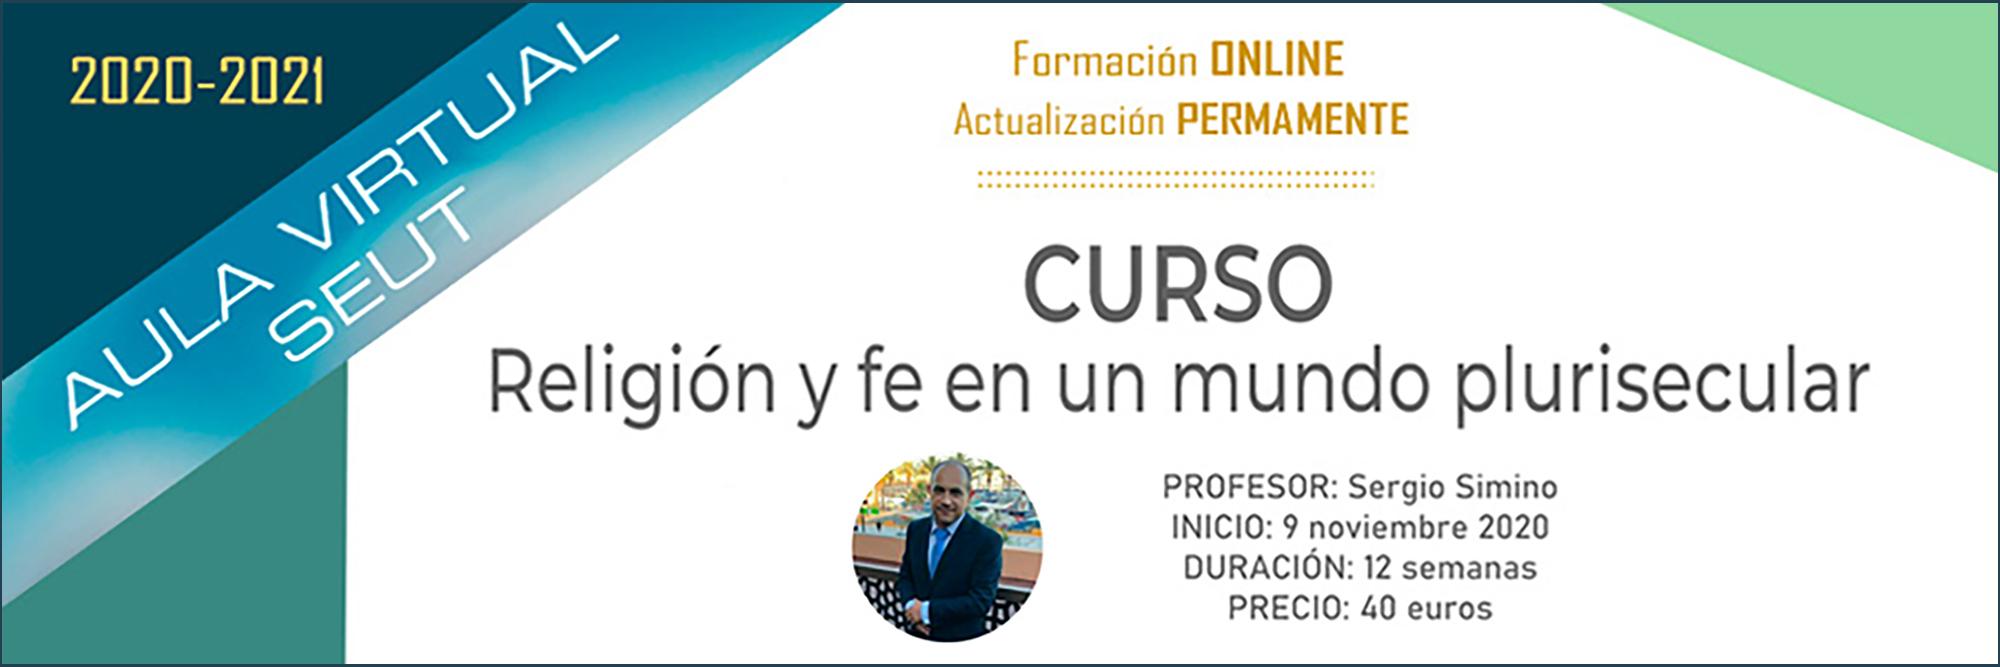 Curso Aula Virtual profesor Sergio Simino